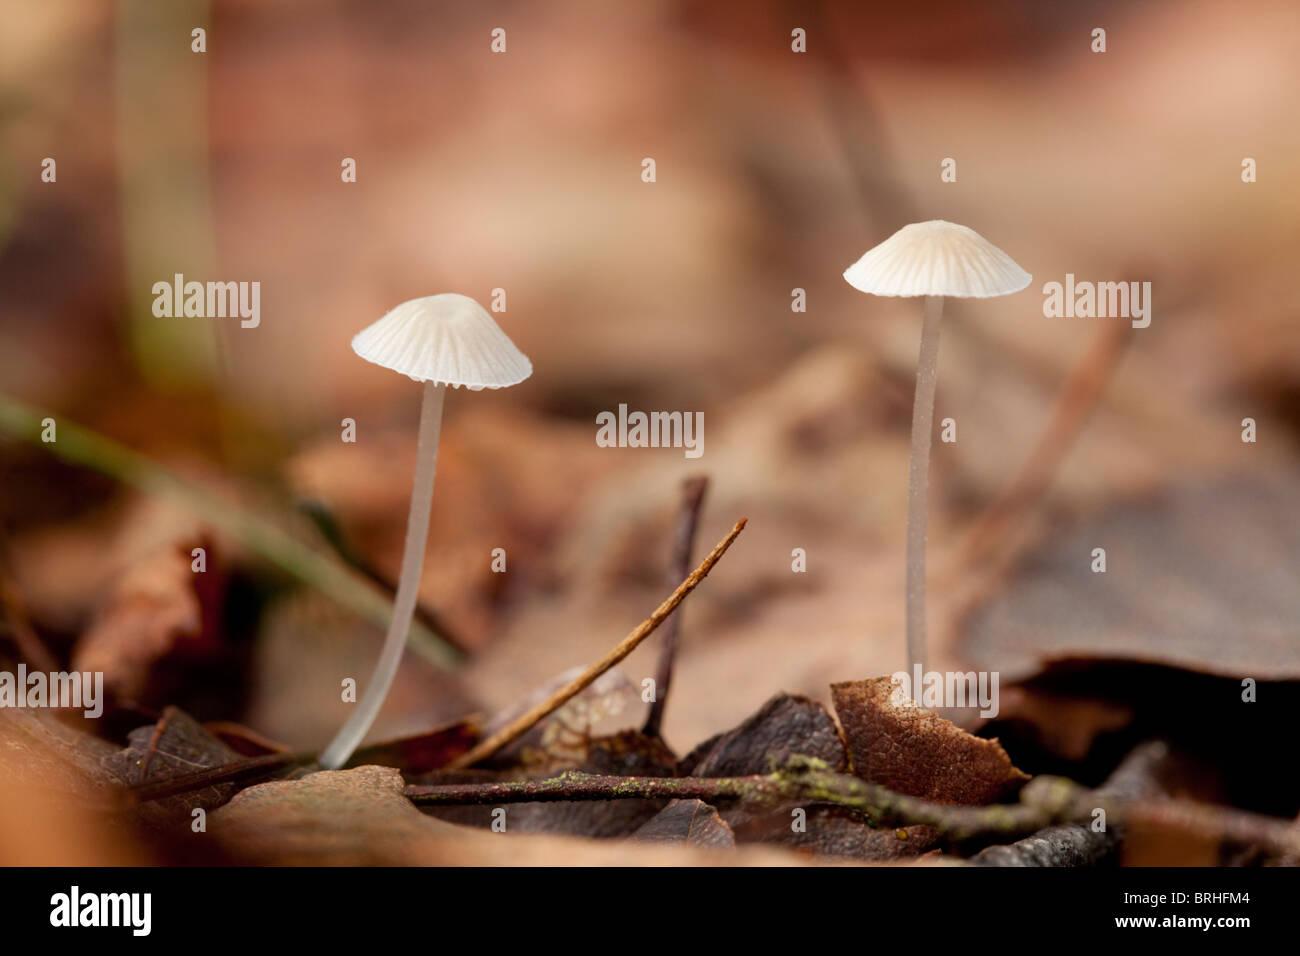 Earthy Inocybe. Fall 2010, Herperduin, Herpen, The Netherlands. - Stock Image